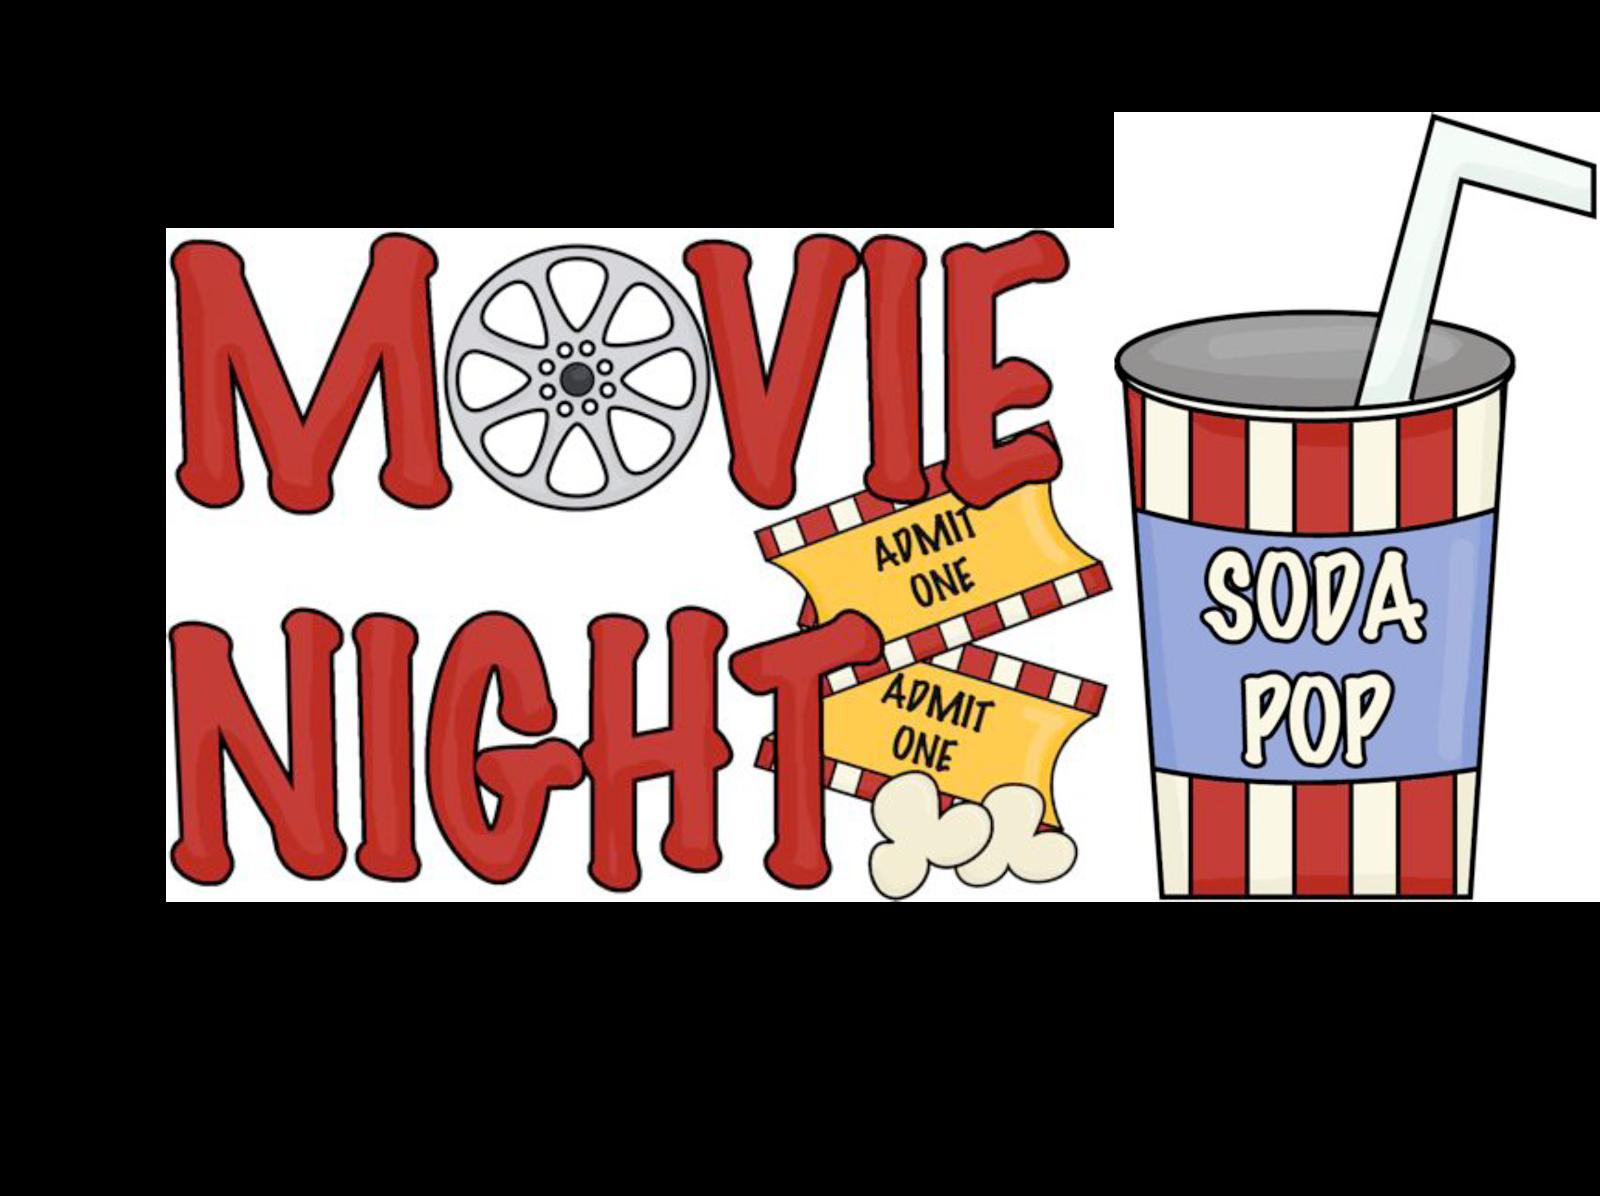 Movies night cliparts svg download Free Cinema Night Cliparts, Download Free Clip Art, Free ... svg download